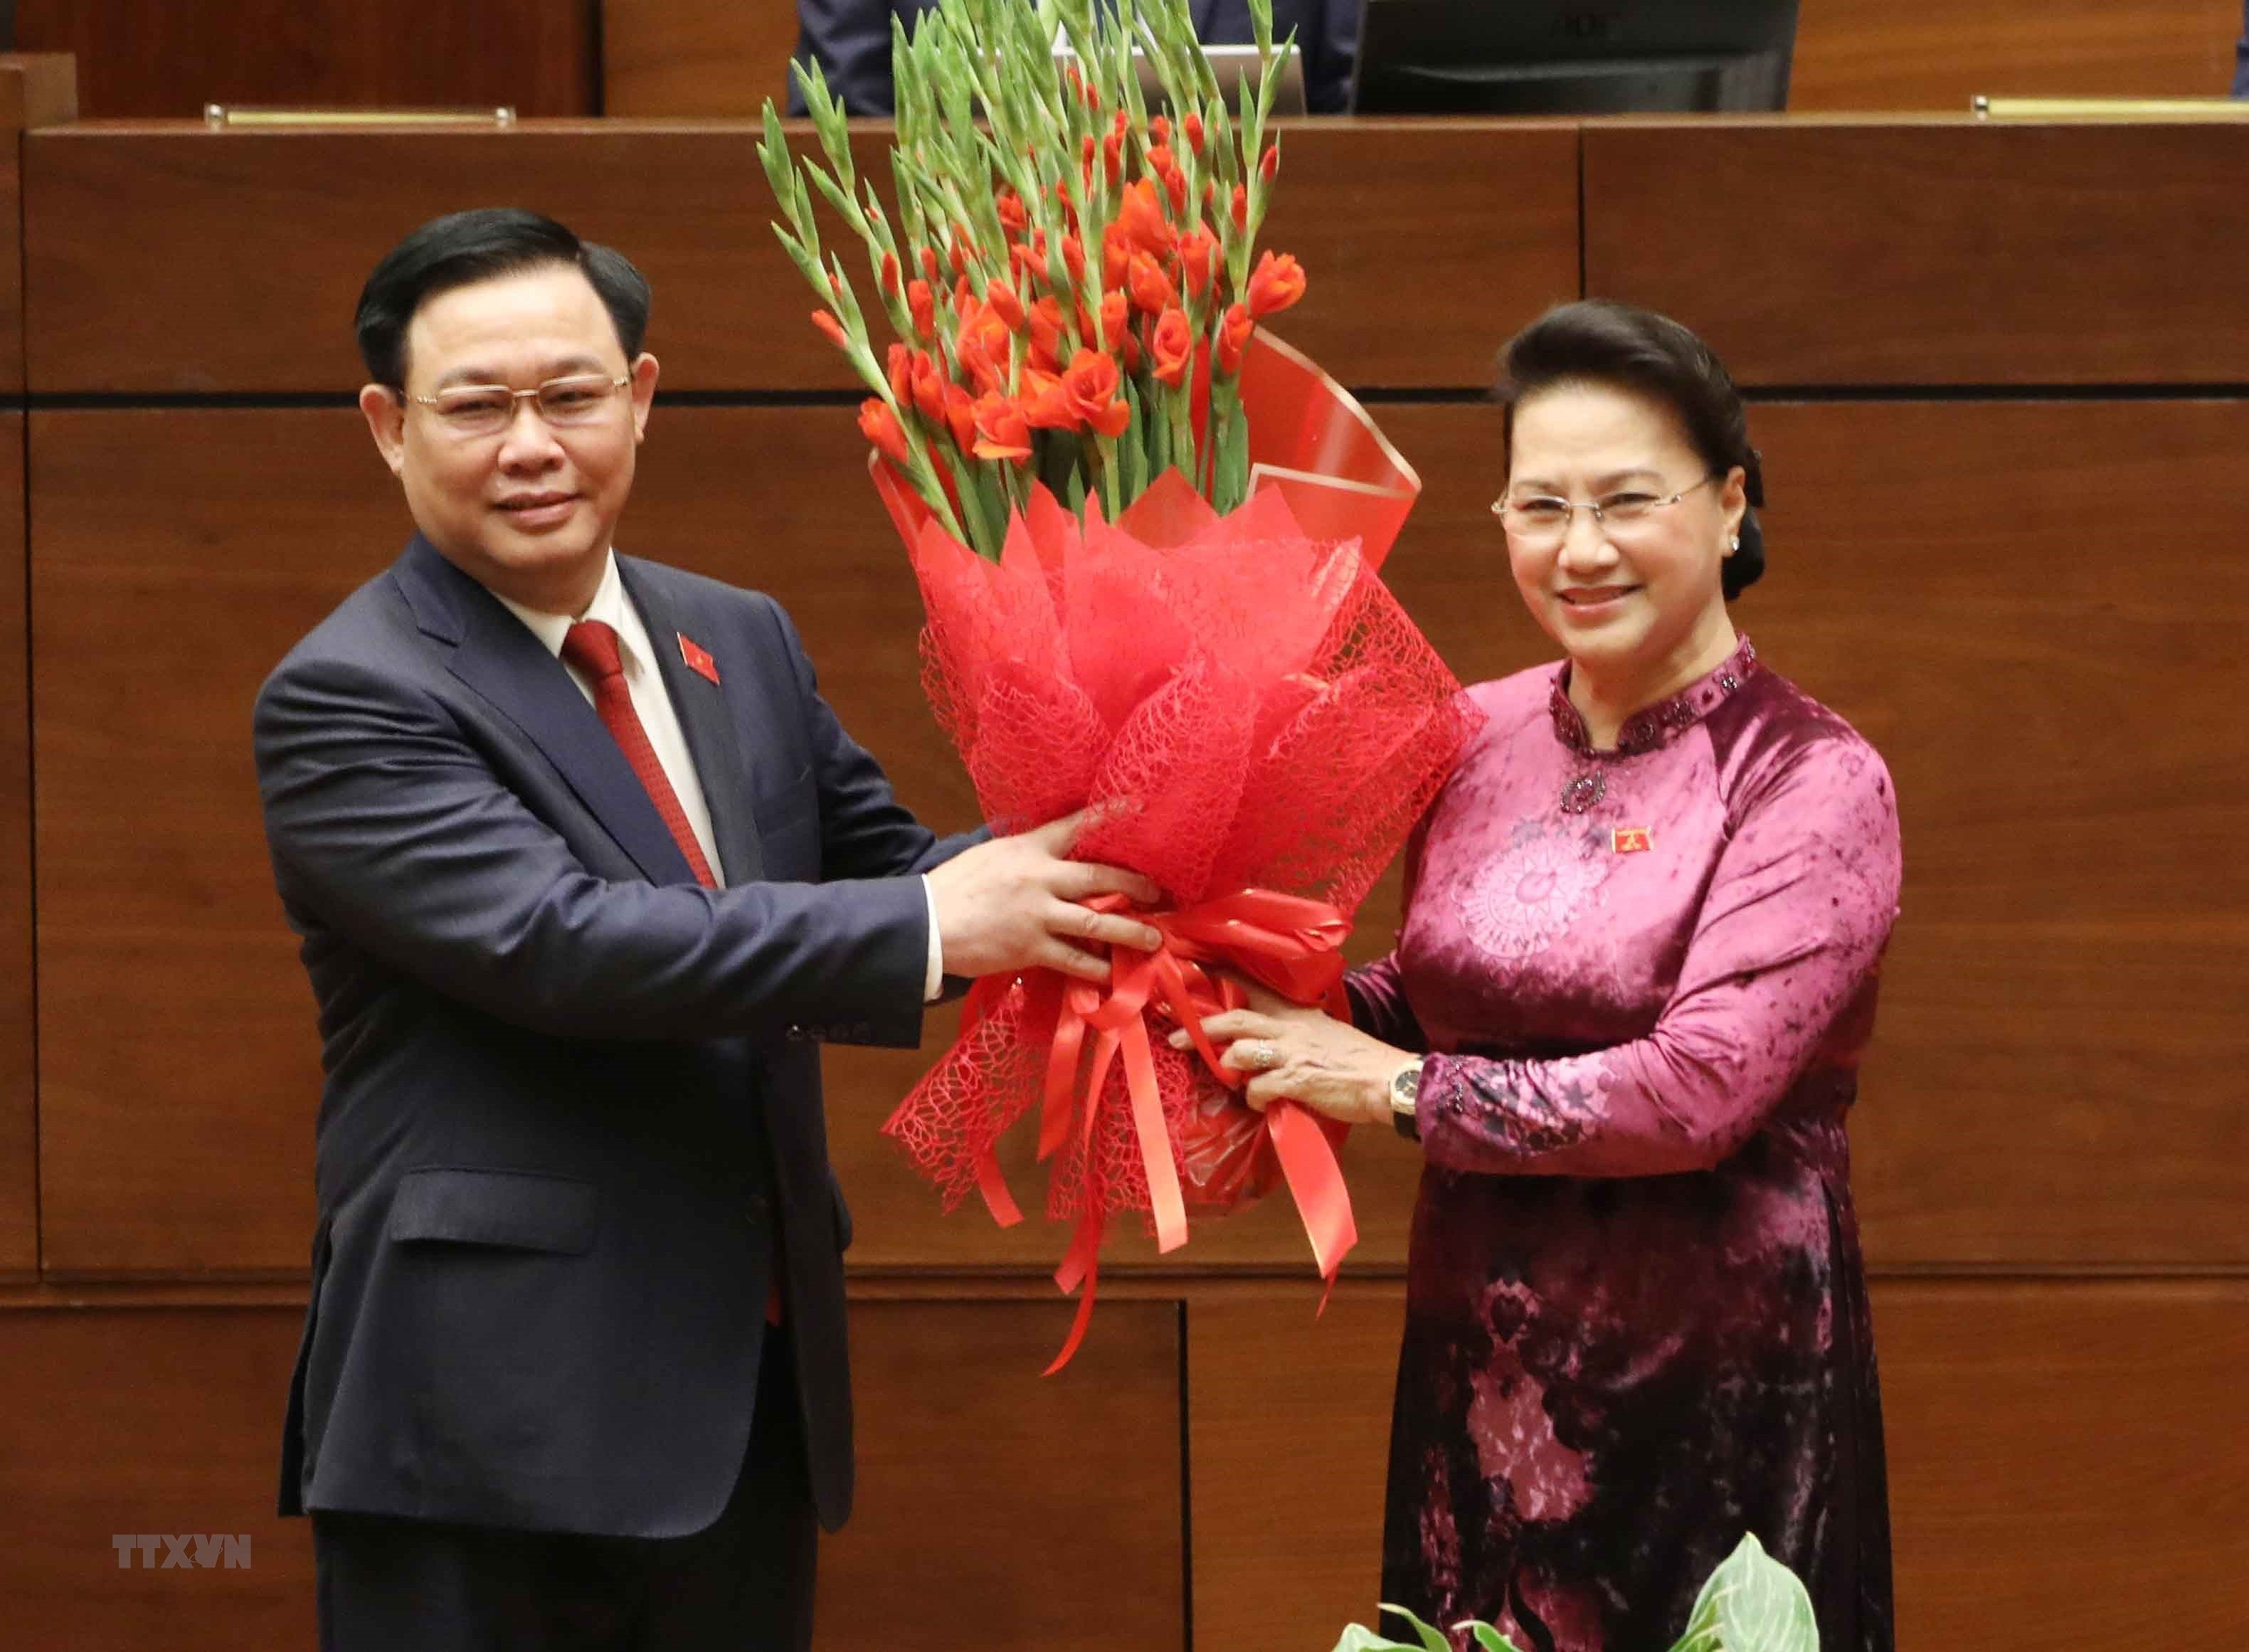 [Photo] Chu tich Quoc hoi Vuong Dinh Hue tuyen the nham chuc hinh anh 10